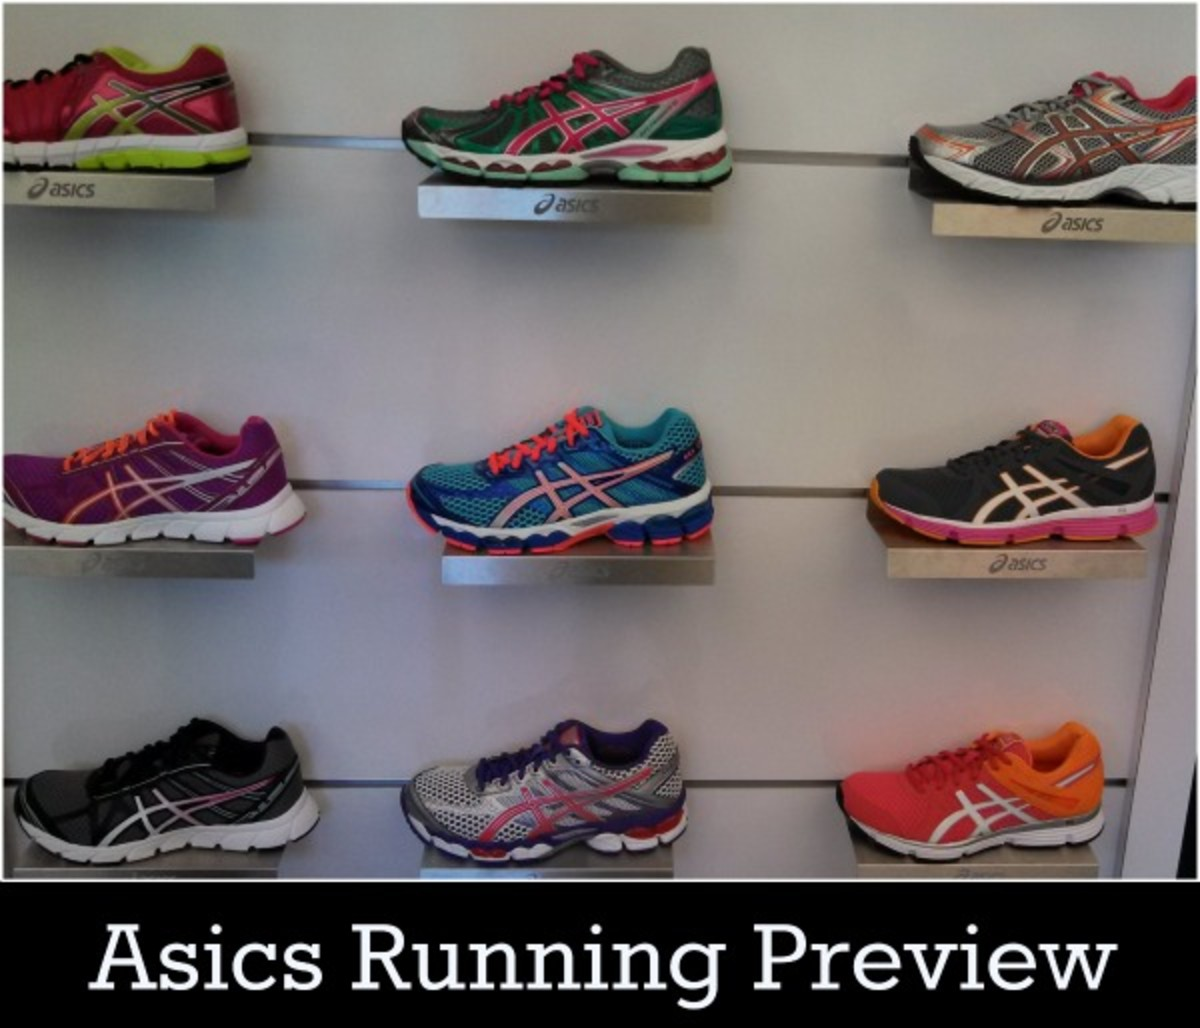 asics running preview